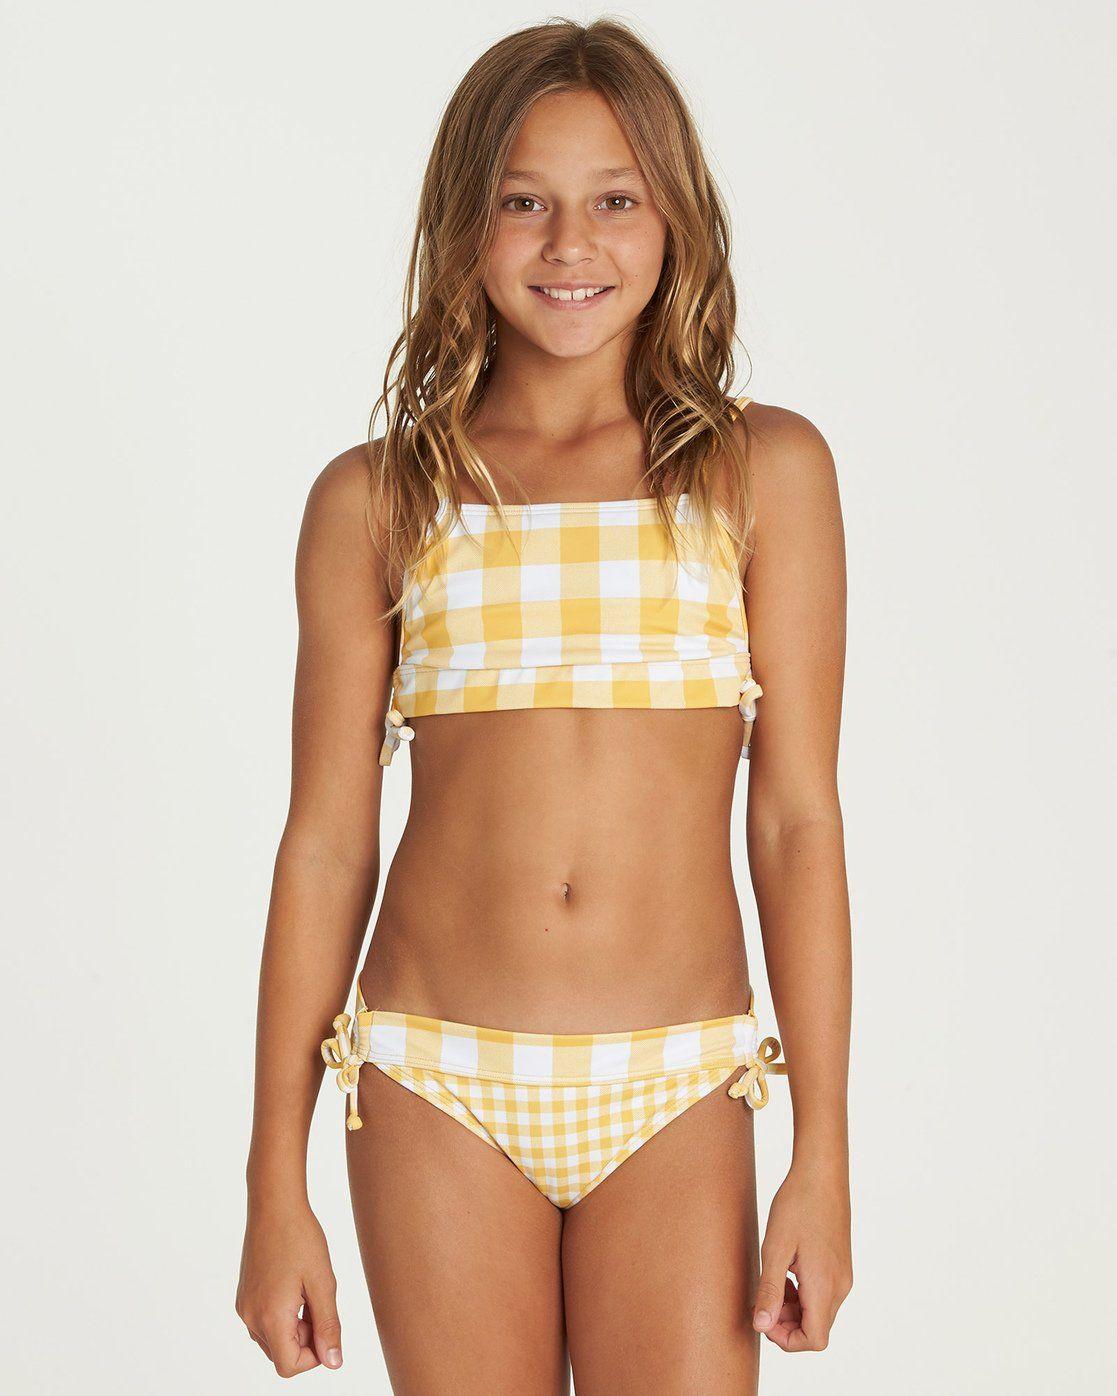 Billabong 10 Girls Pink Sol Searcher Board Shorts Swimsuit Cover-up Summer